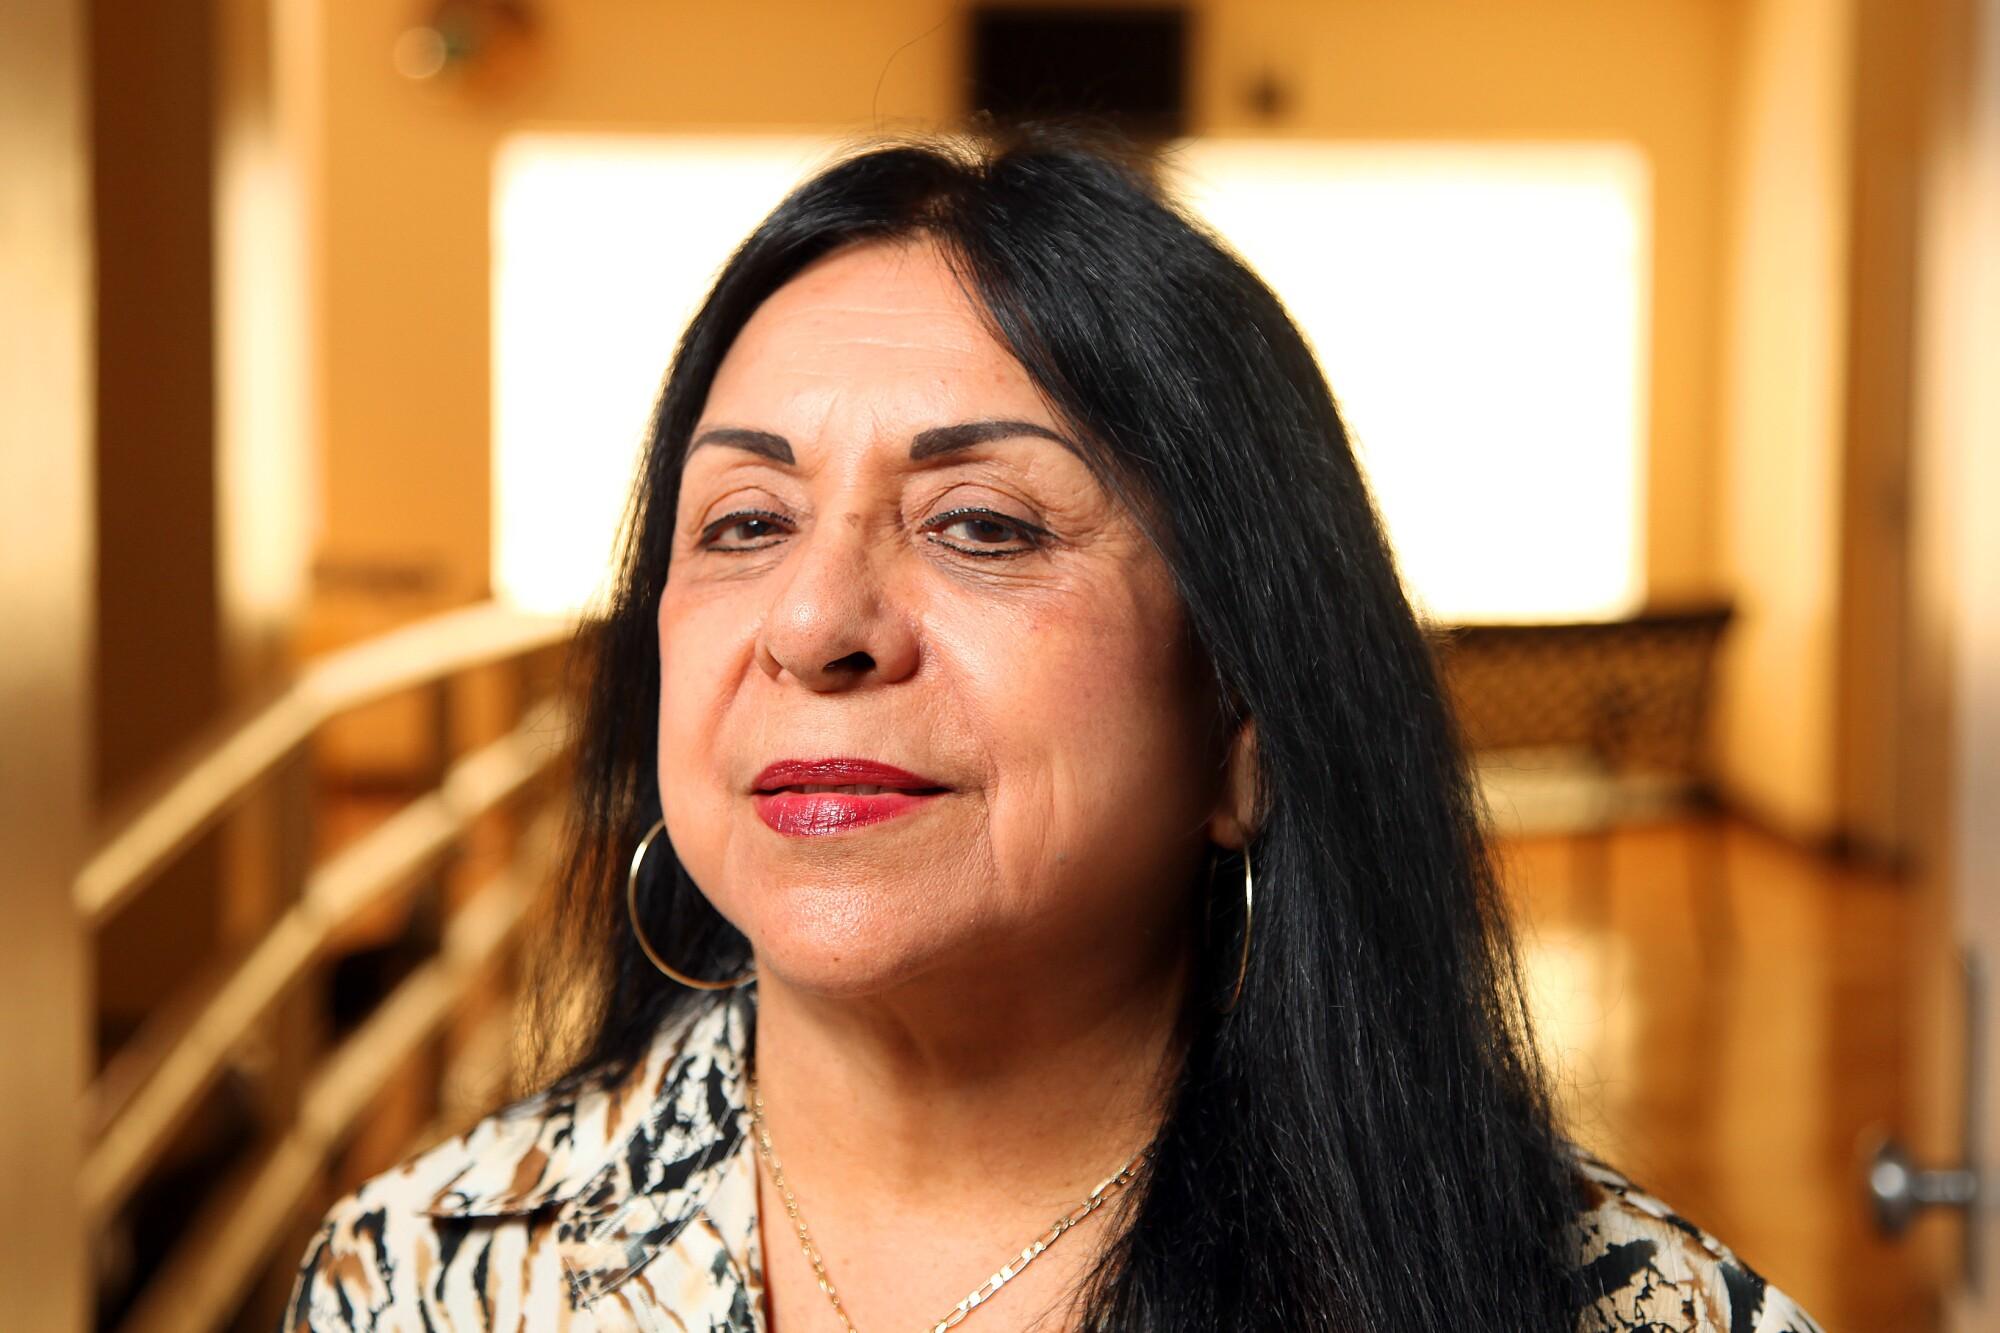 Rachel Ortiz, longtime community activist and founder of Barrio Station.